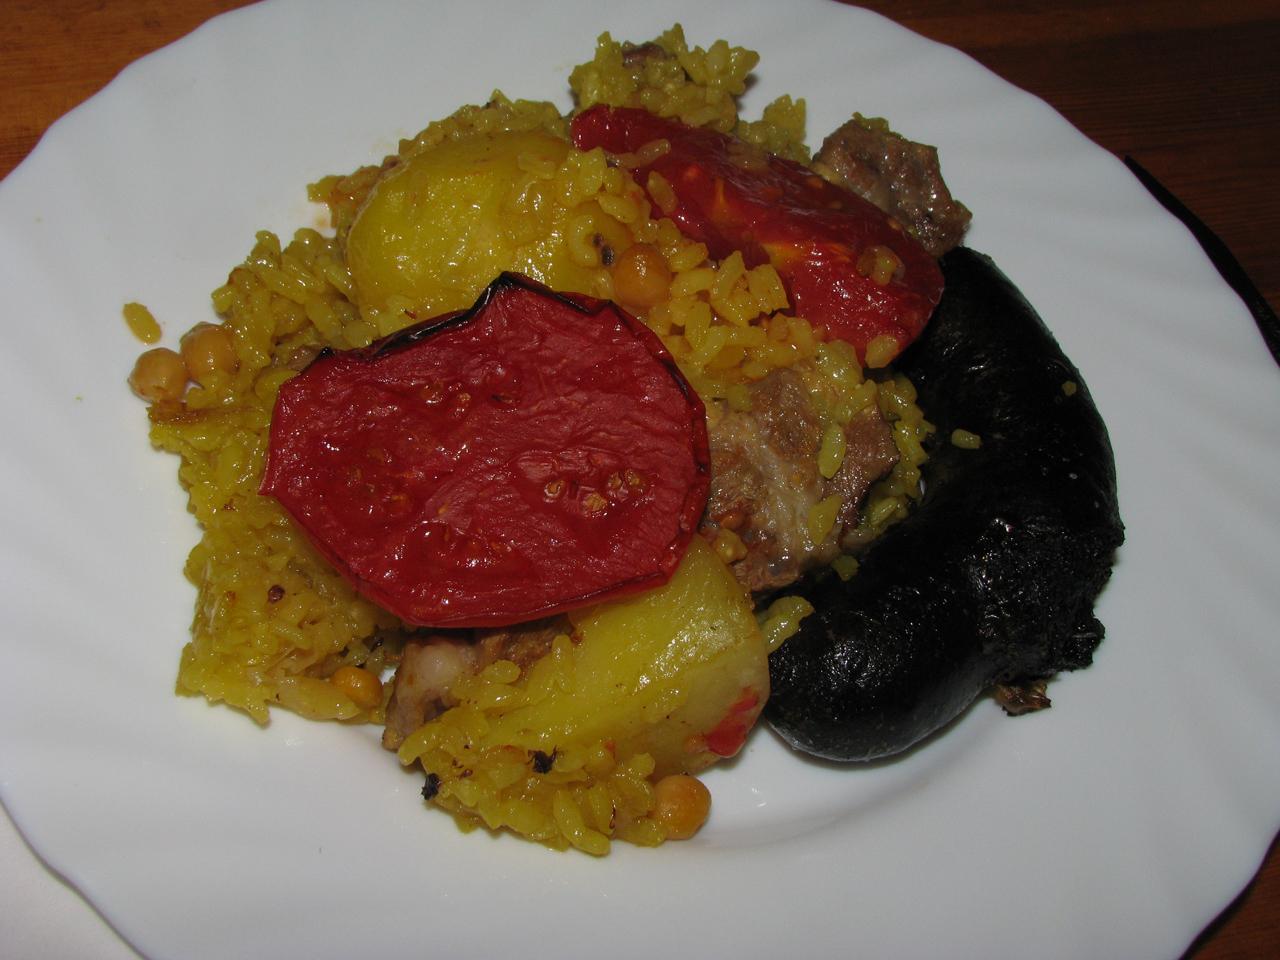 Arròs al forn, sült rizs